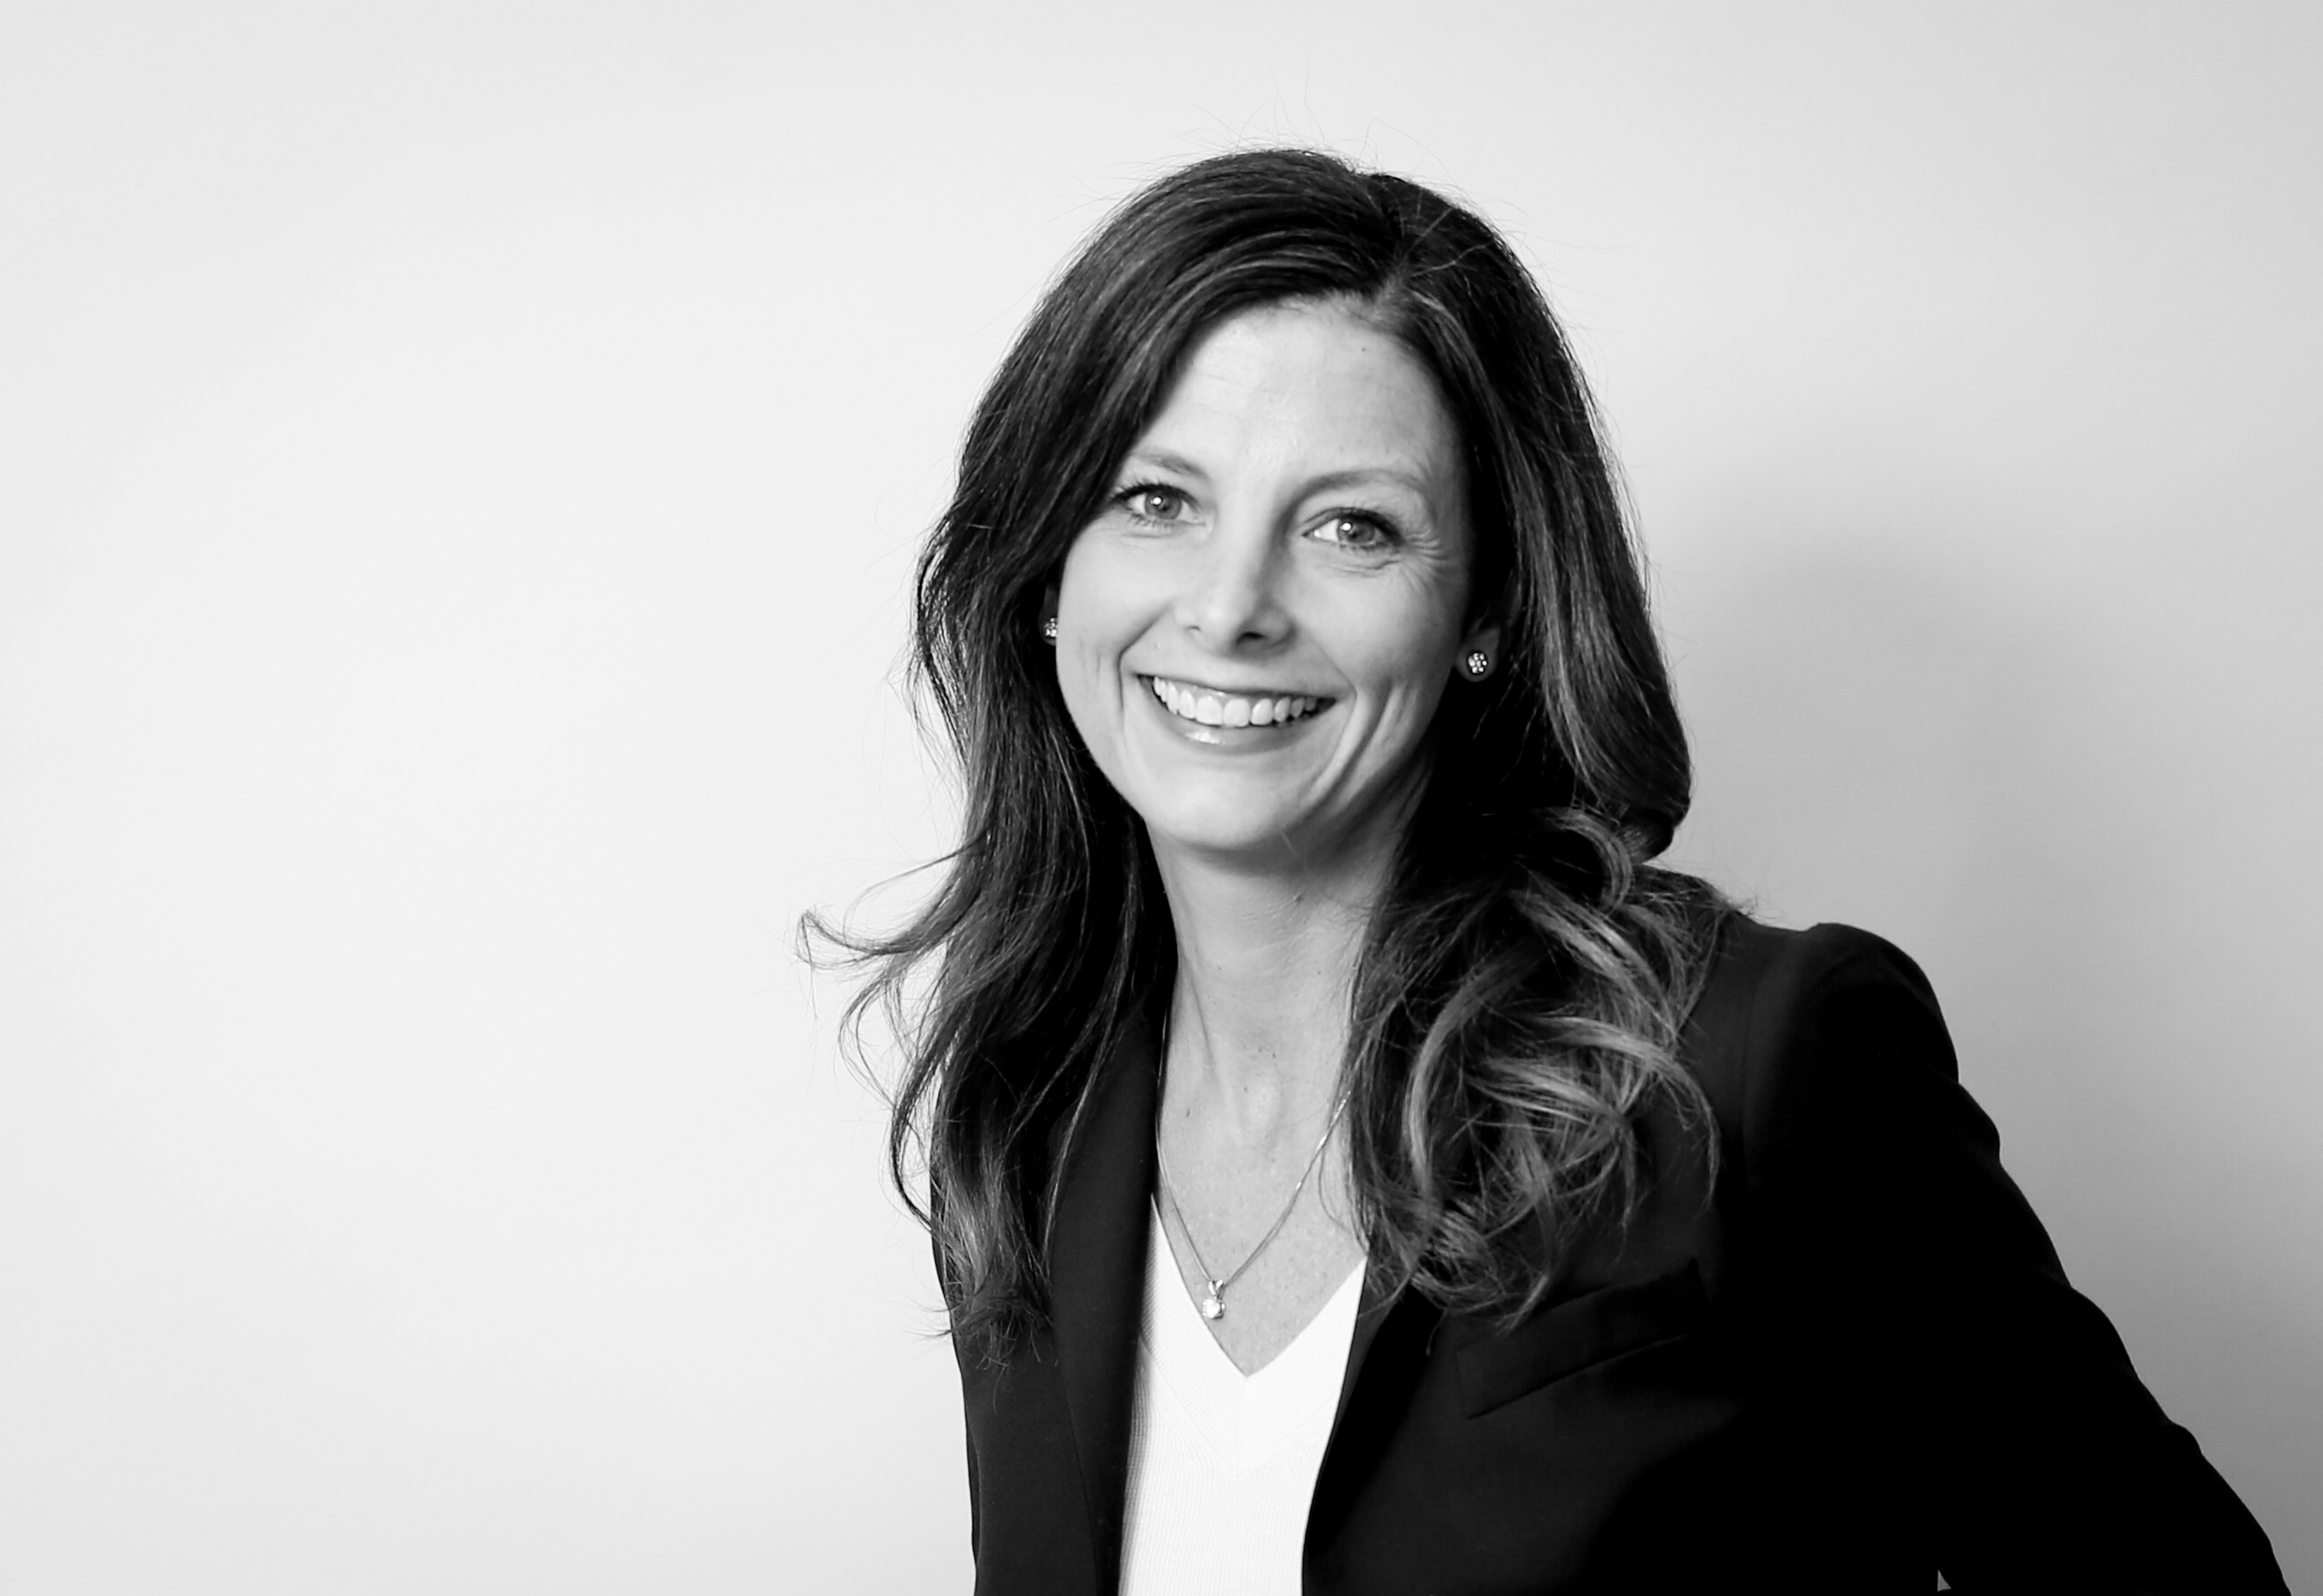 Melissa McMahan